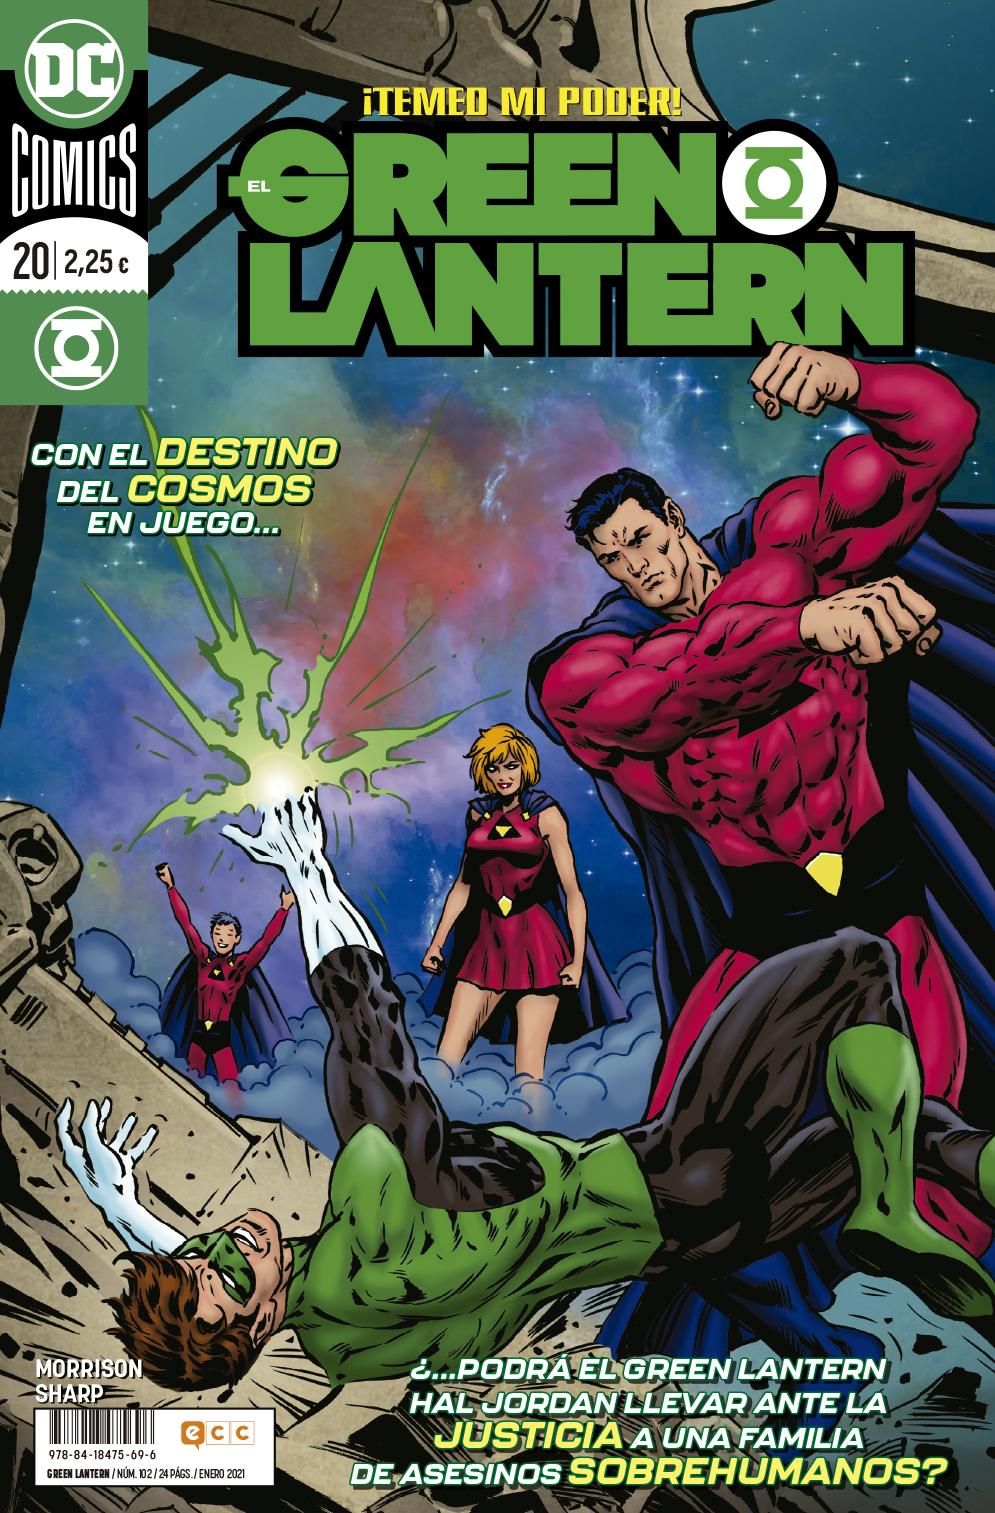 El Green Lantern #102 / 20